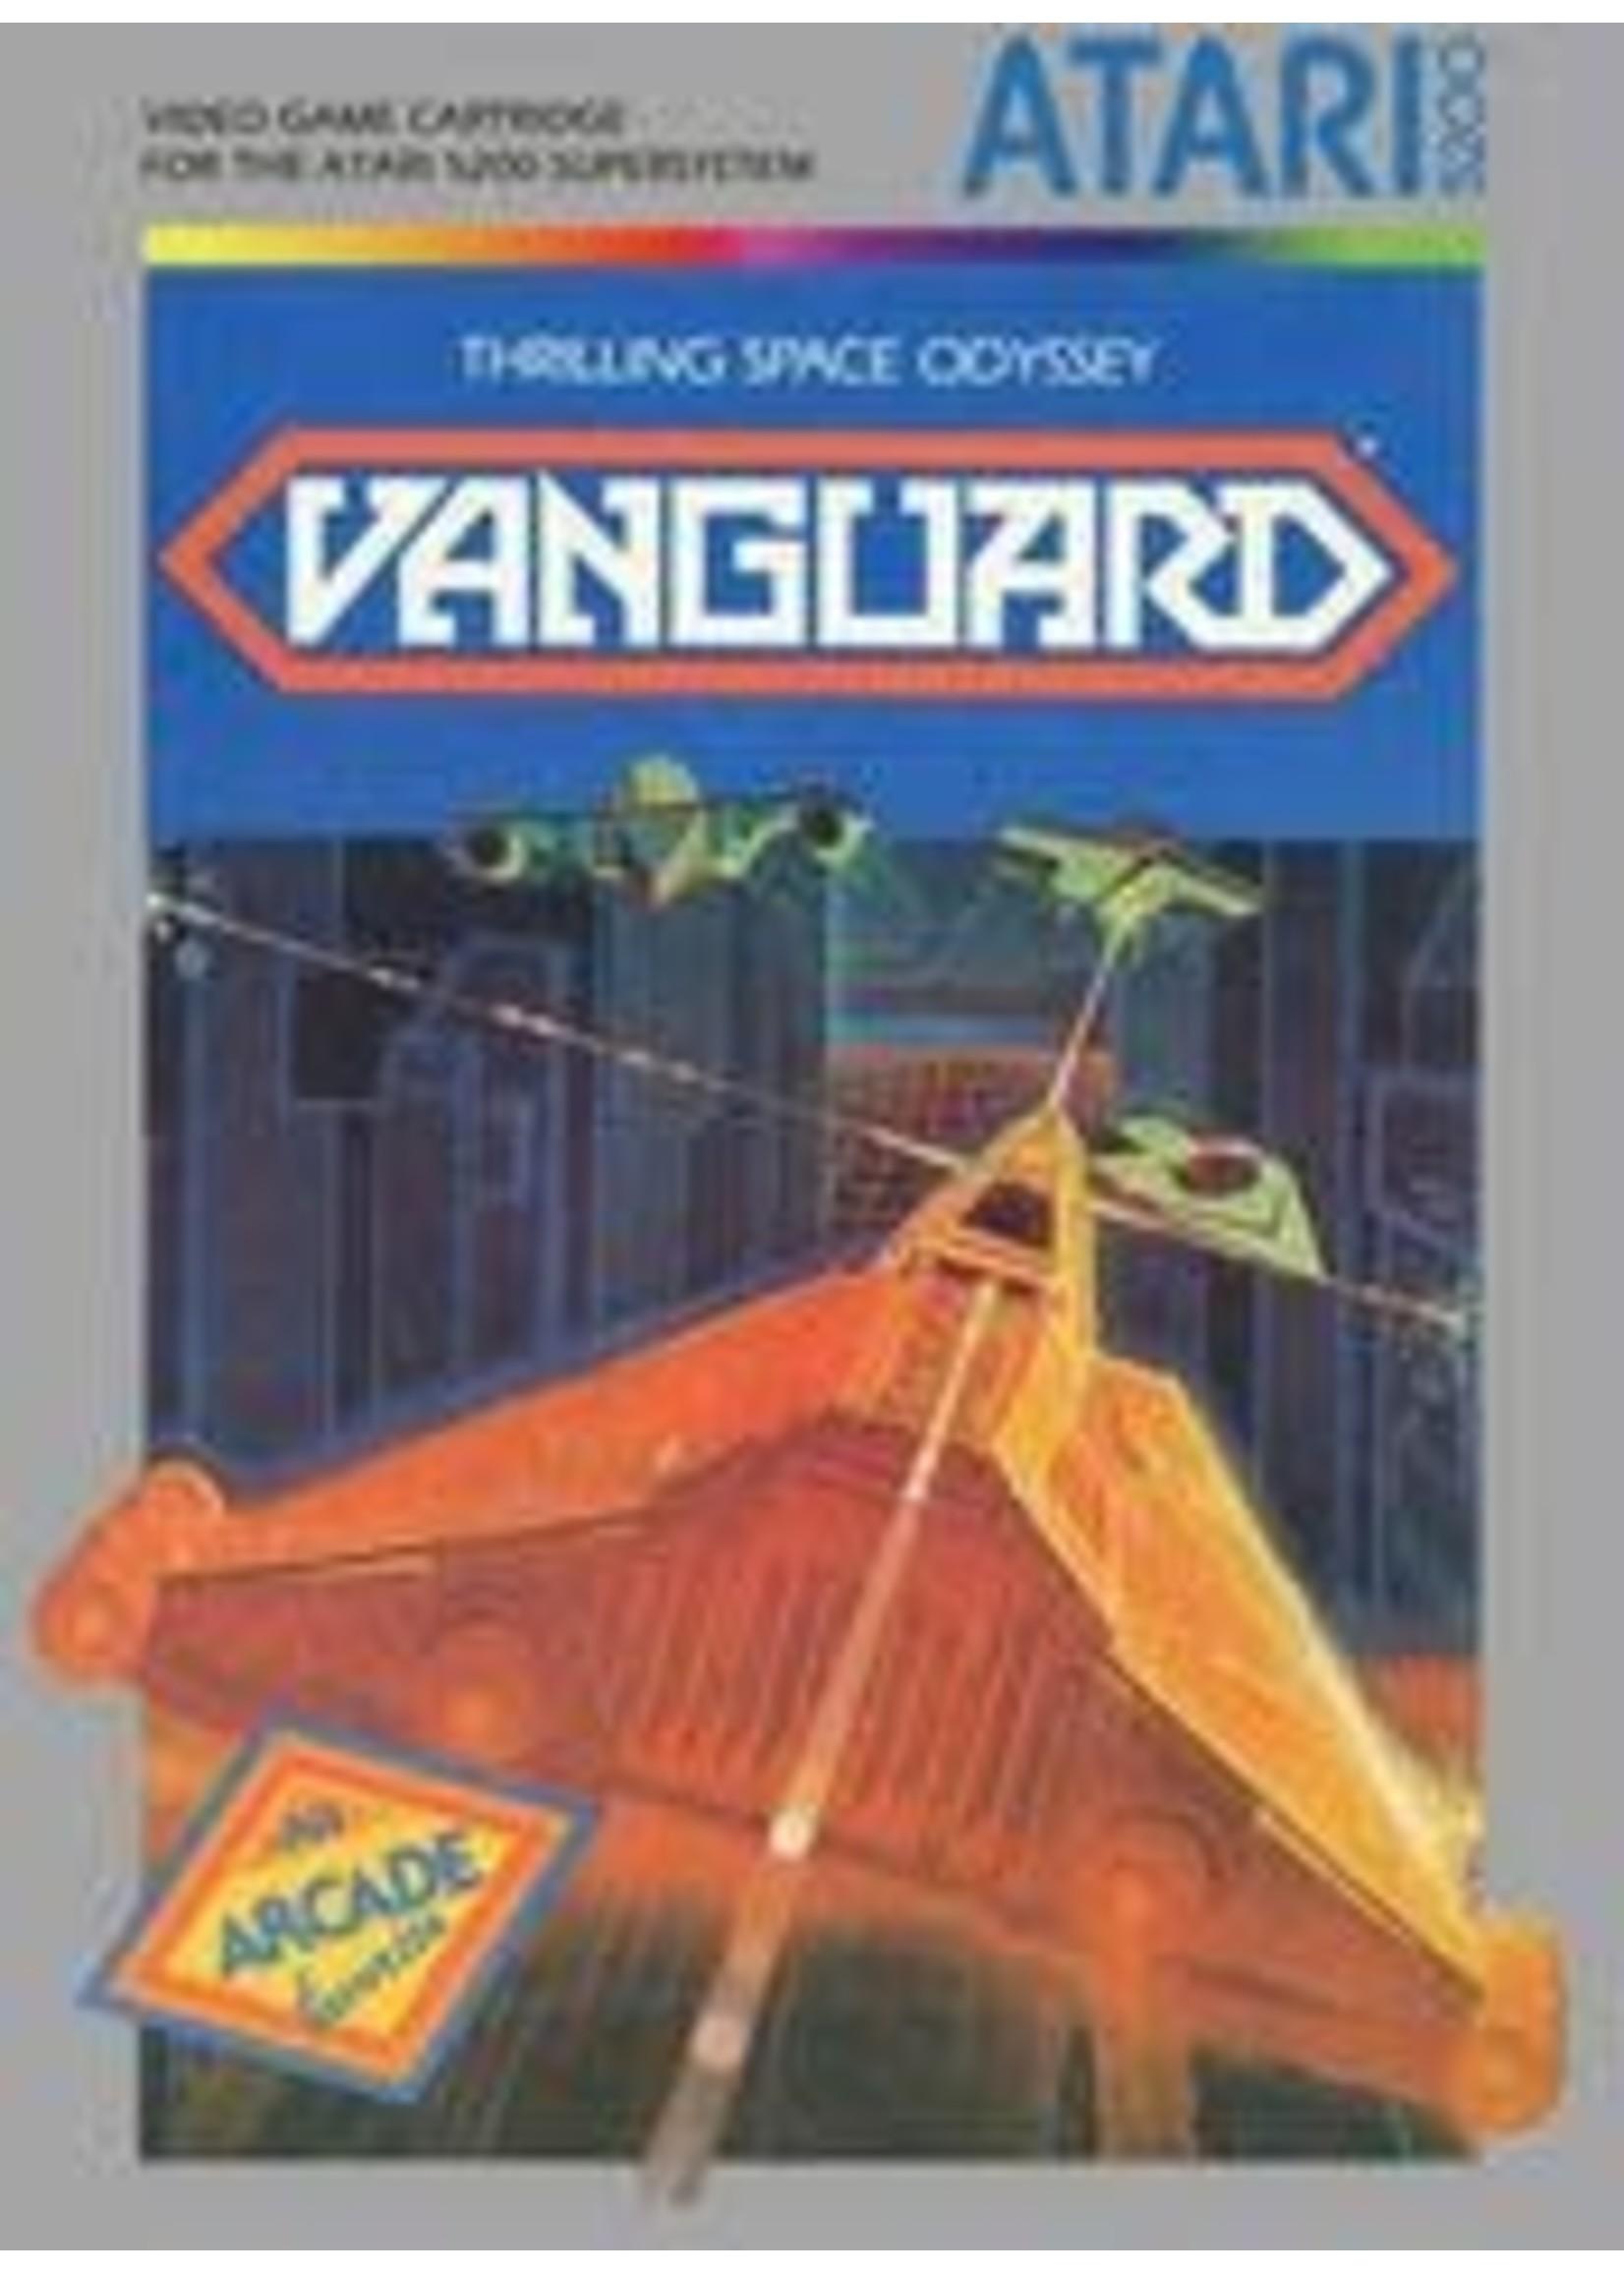 Vanguard Atari 5200